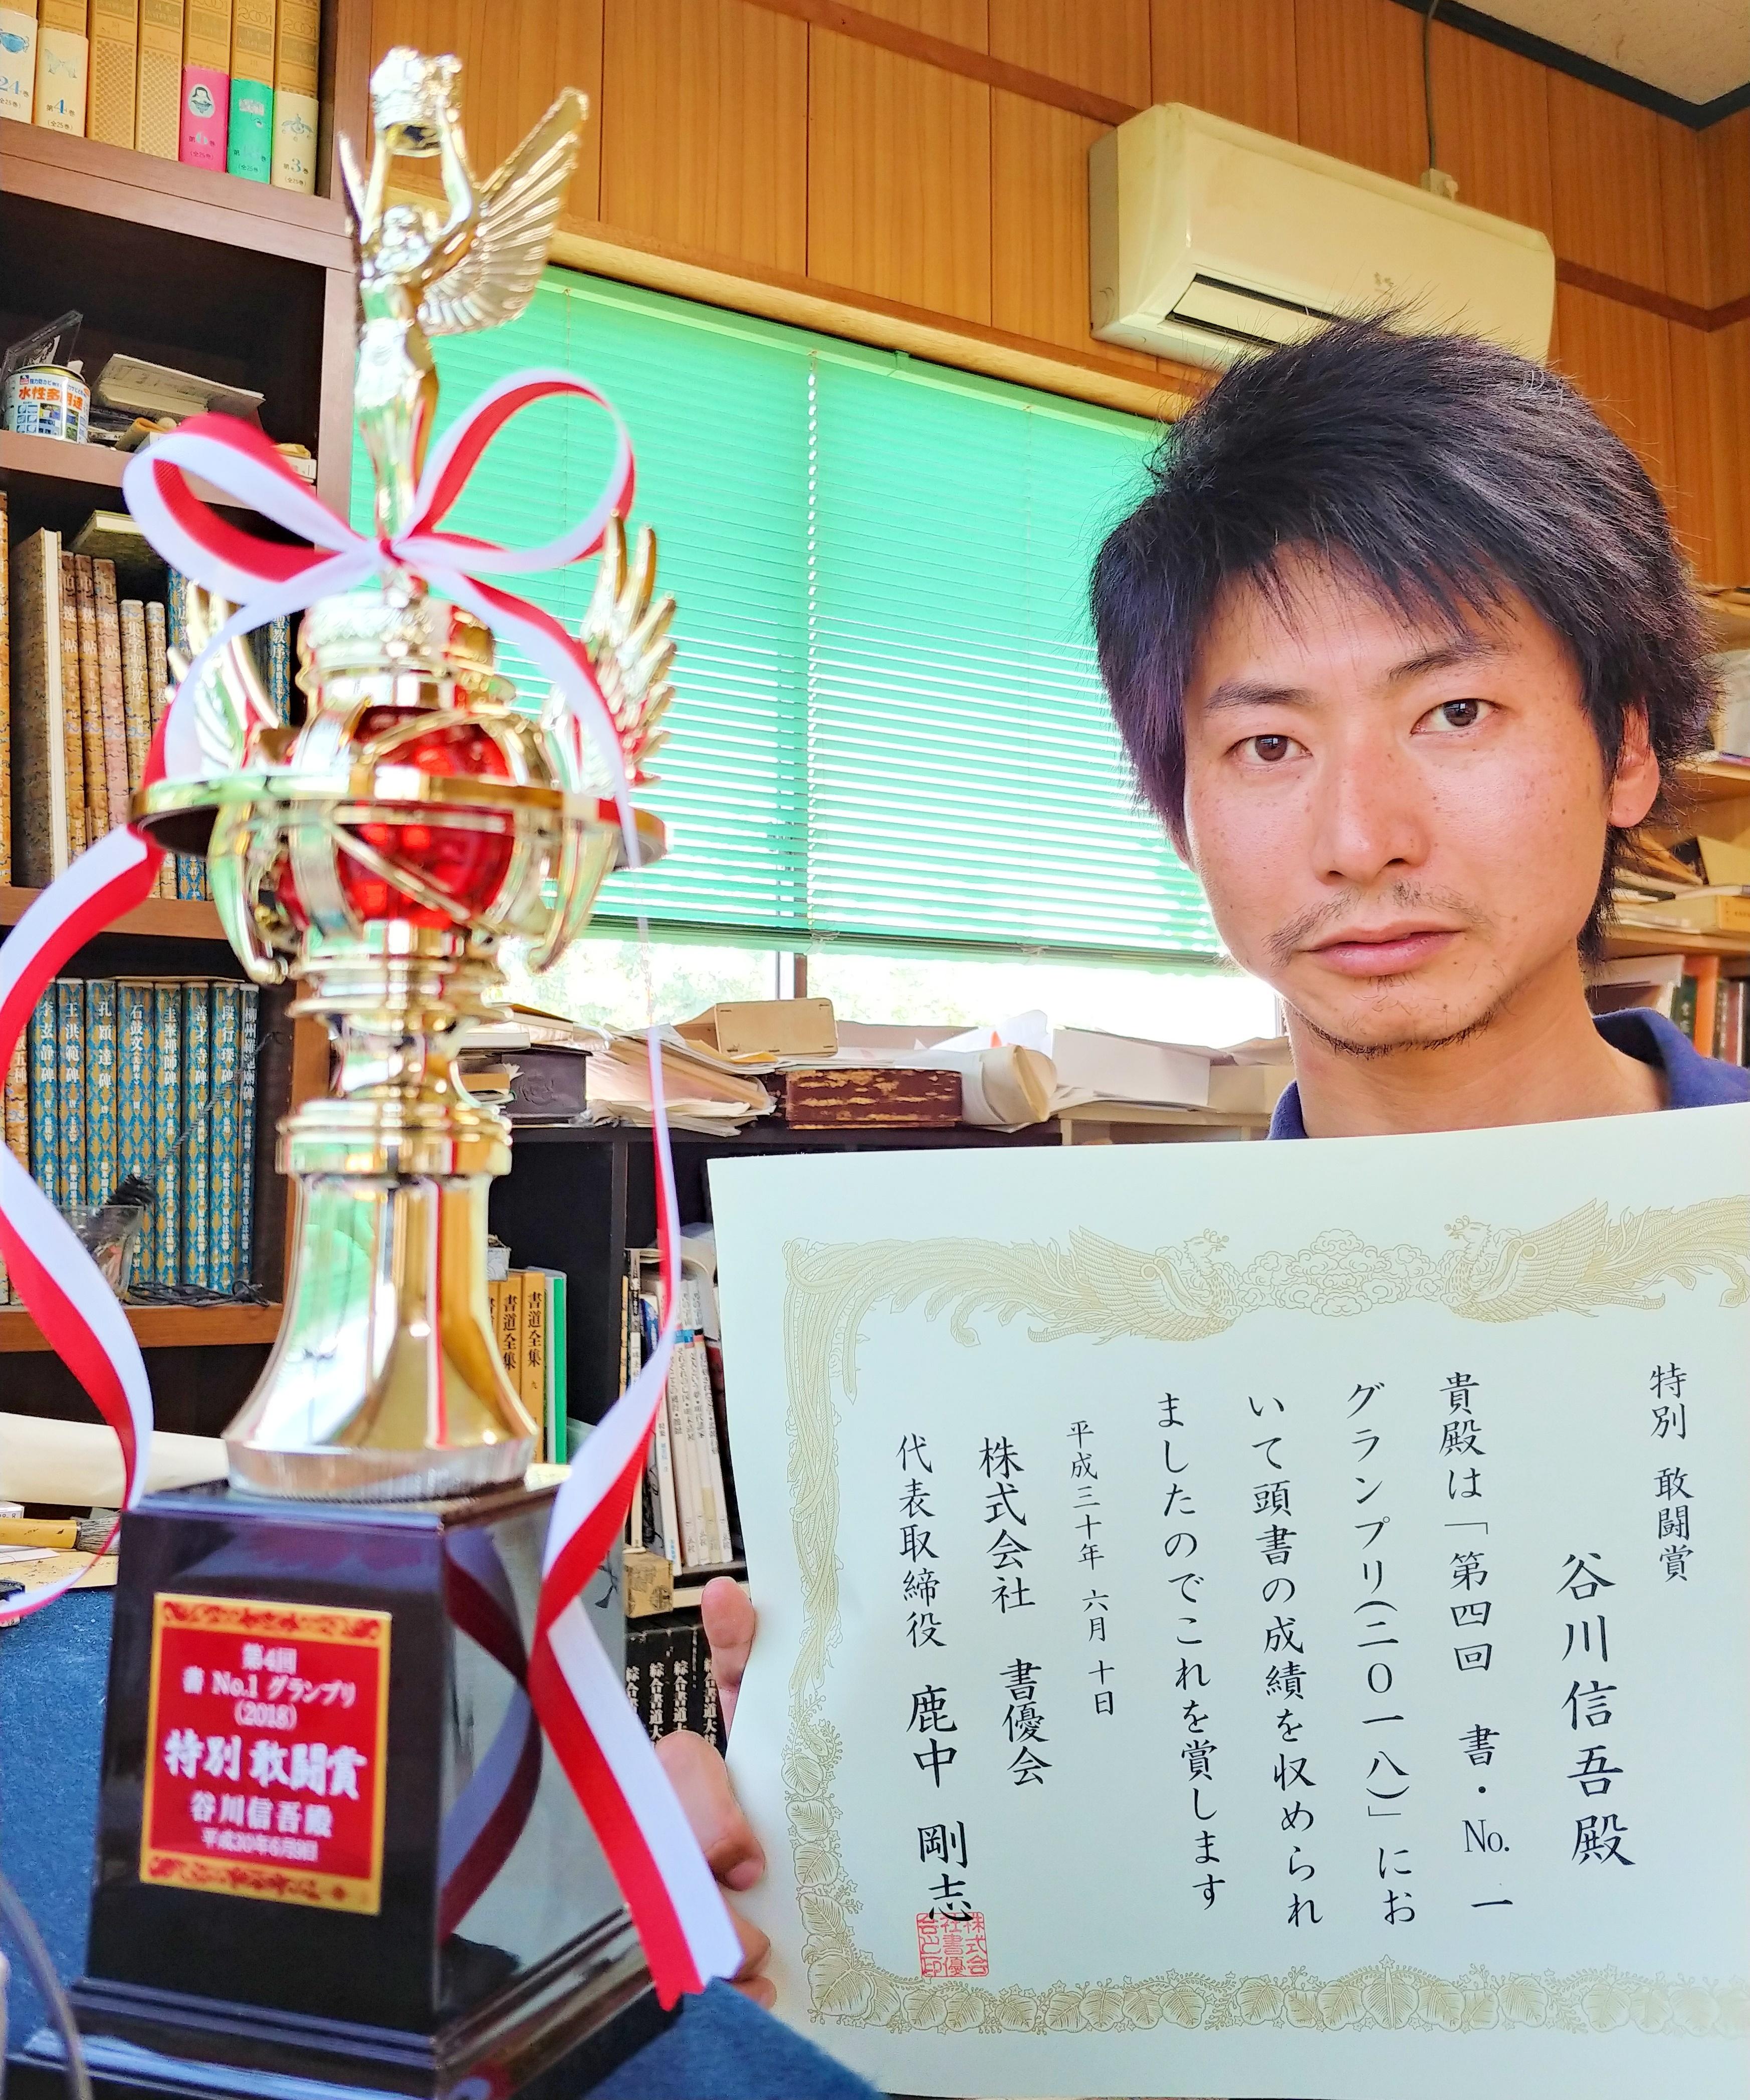 gp-2018-nyushou-特別-敢闘賞-06-28-16-